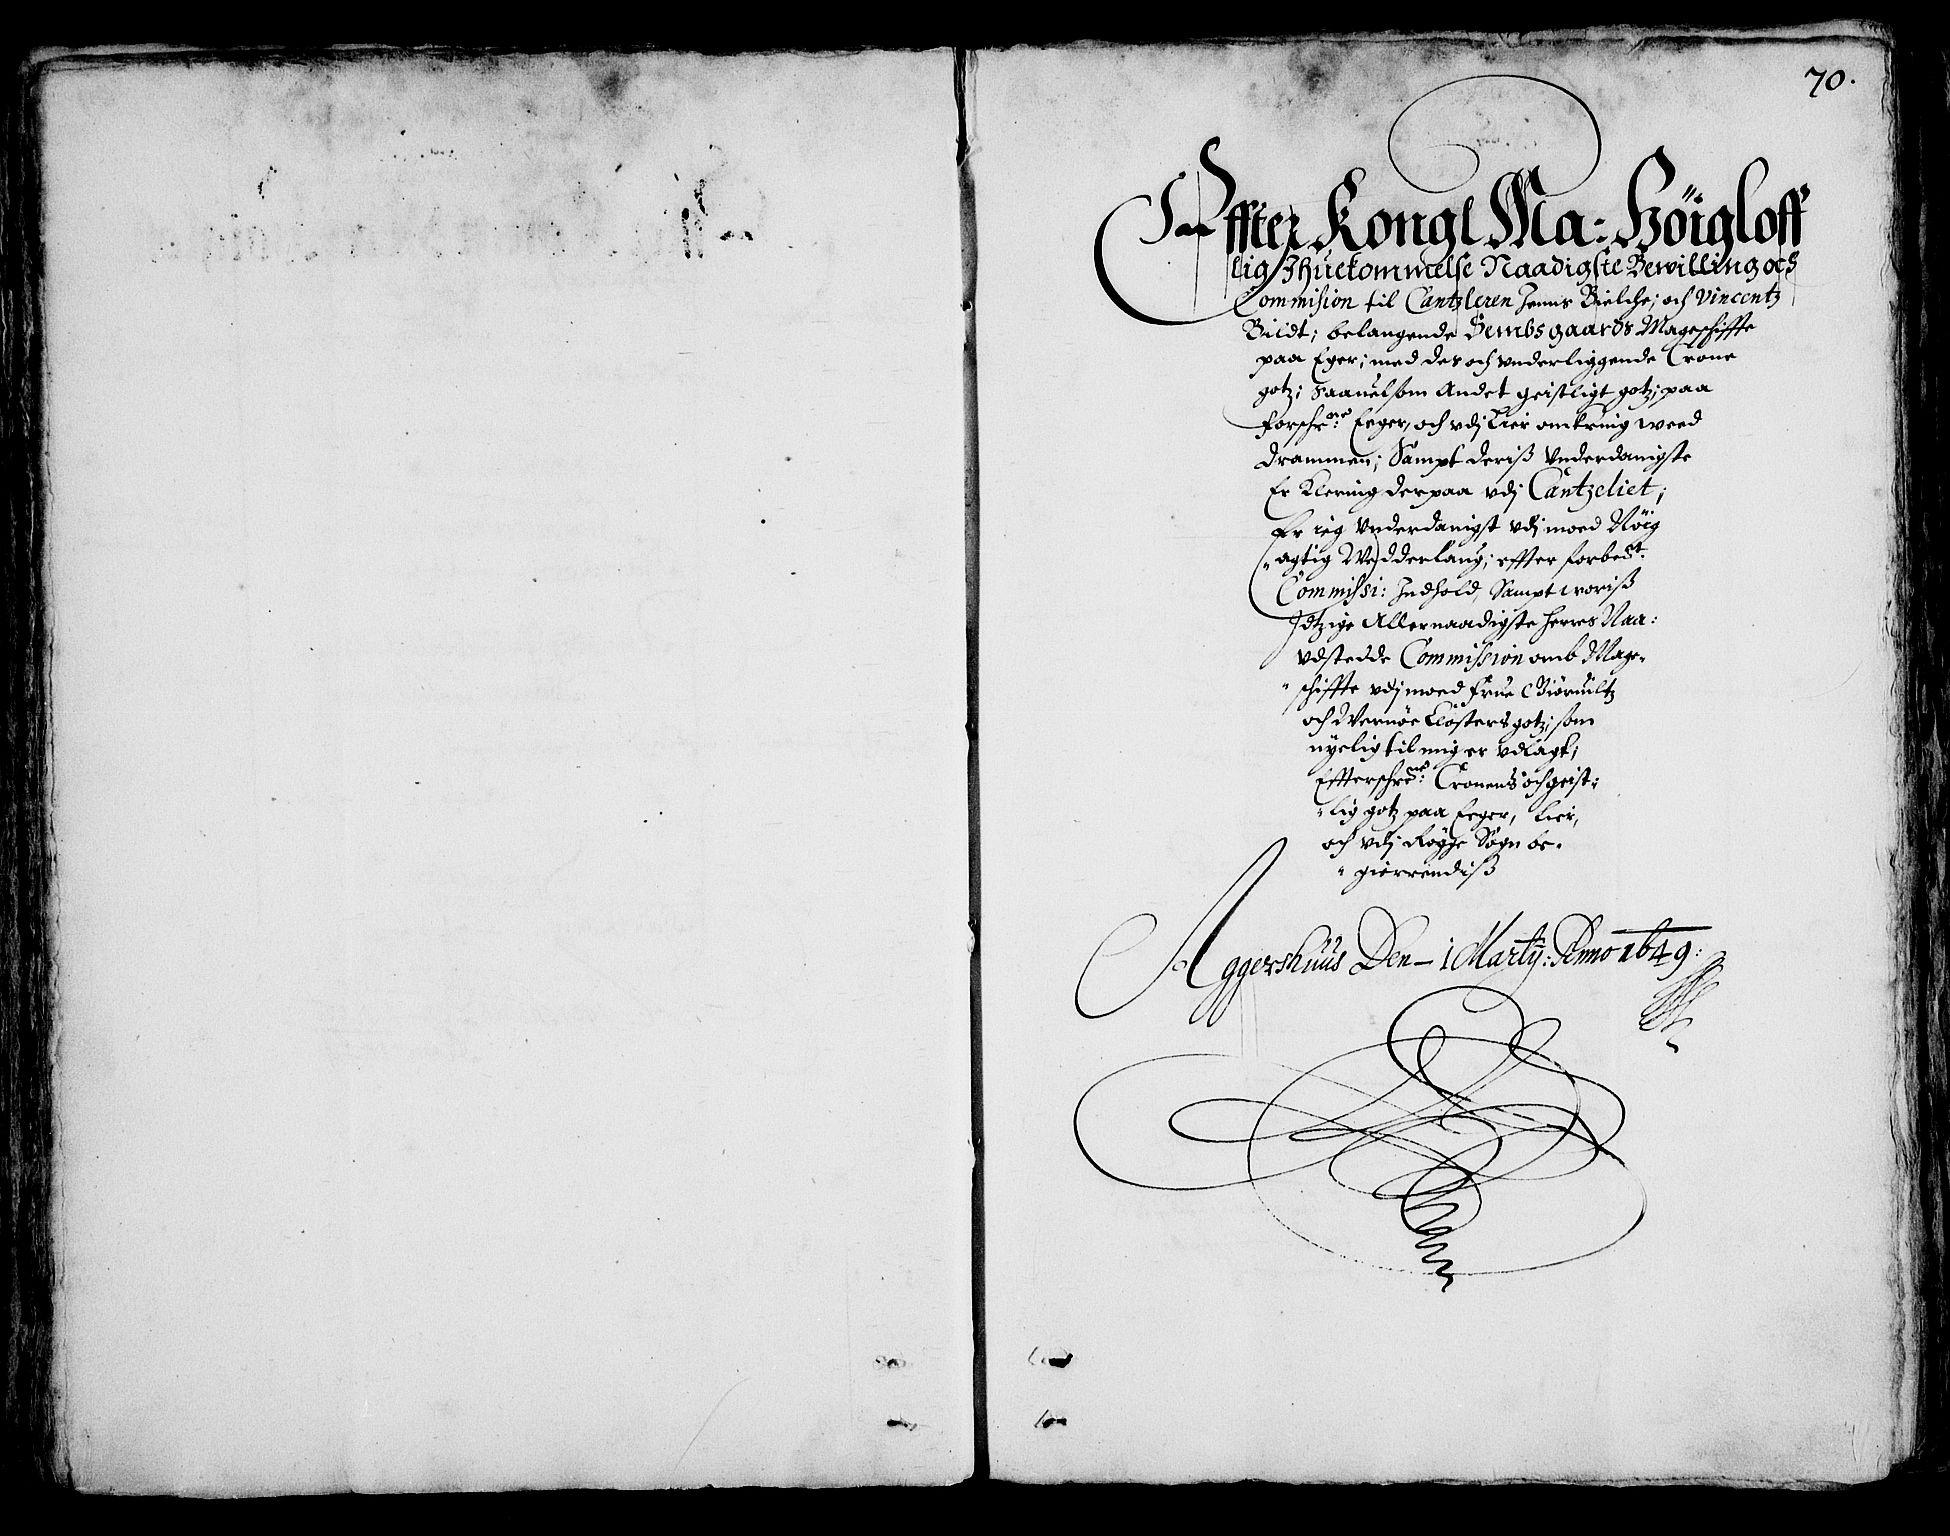 RA, Rentekammeret inntil 1814, Realistisk ordnet avdeling, On/L0001: Statens gods, 1651, s. 69b-70a